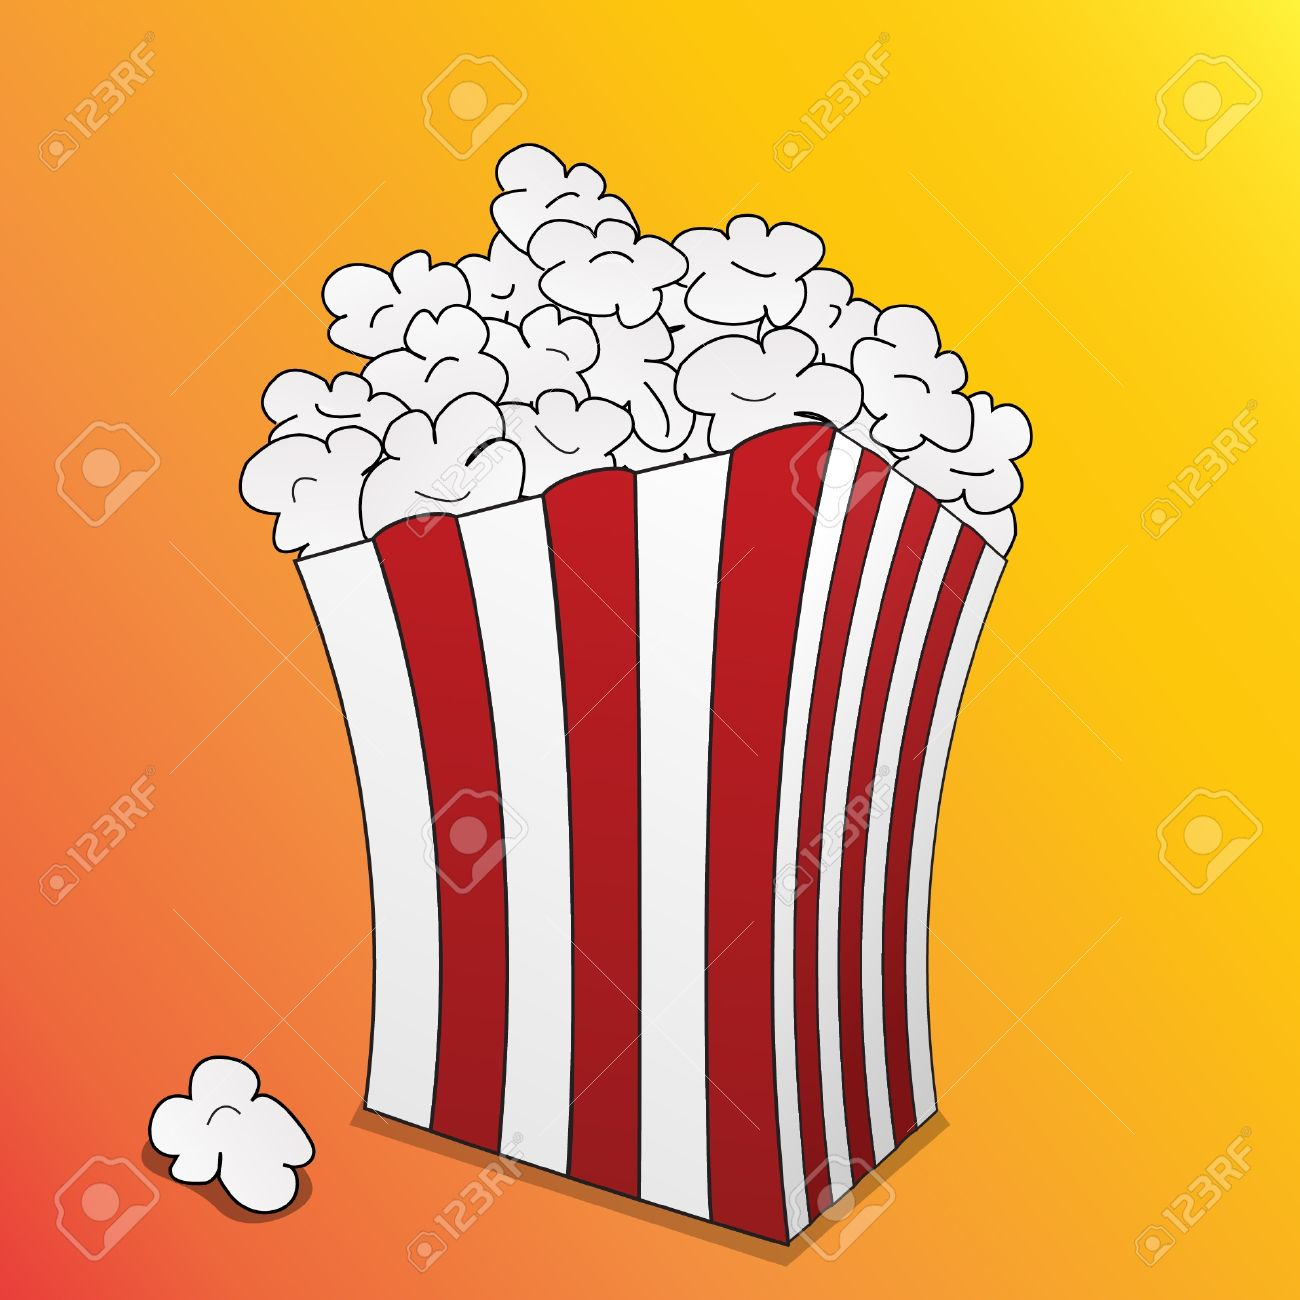 1300x1300 Popcorn Clipart Cartoon